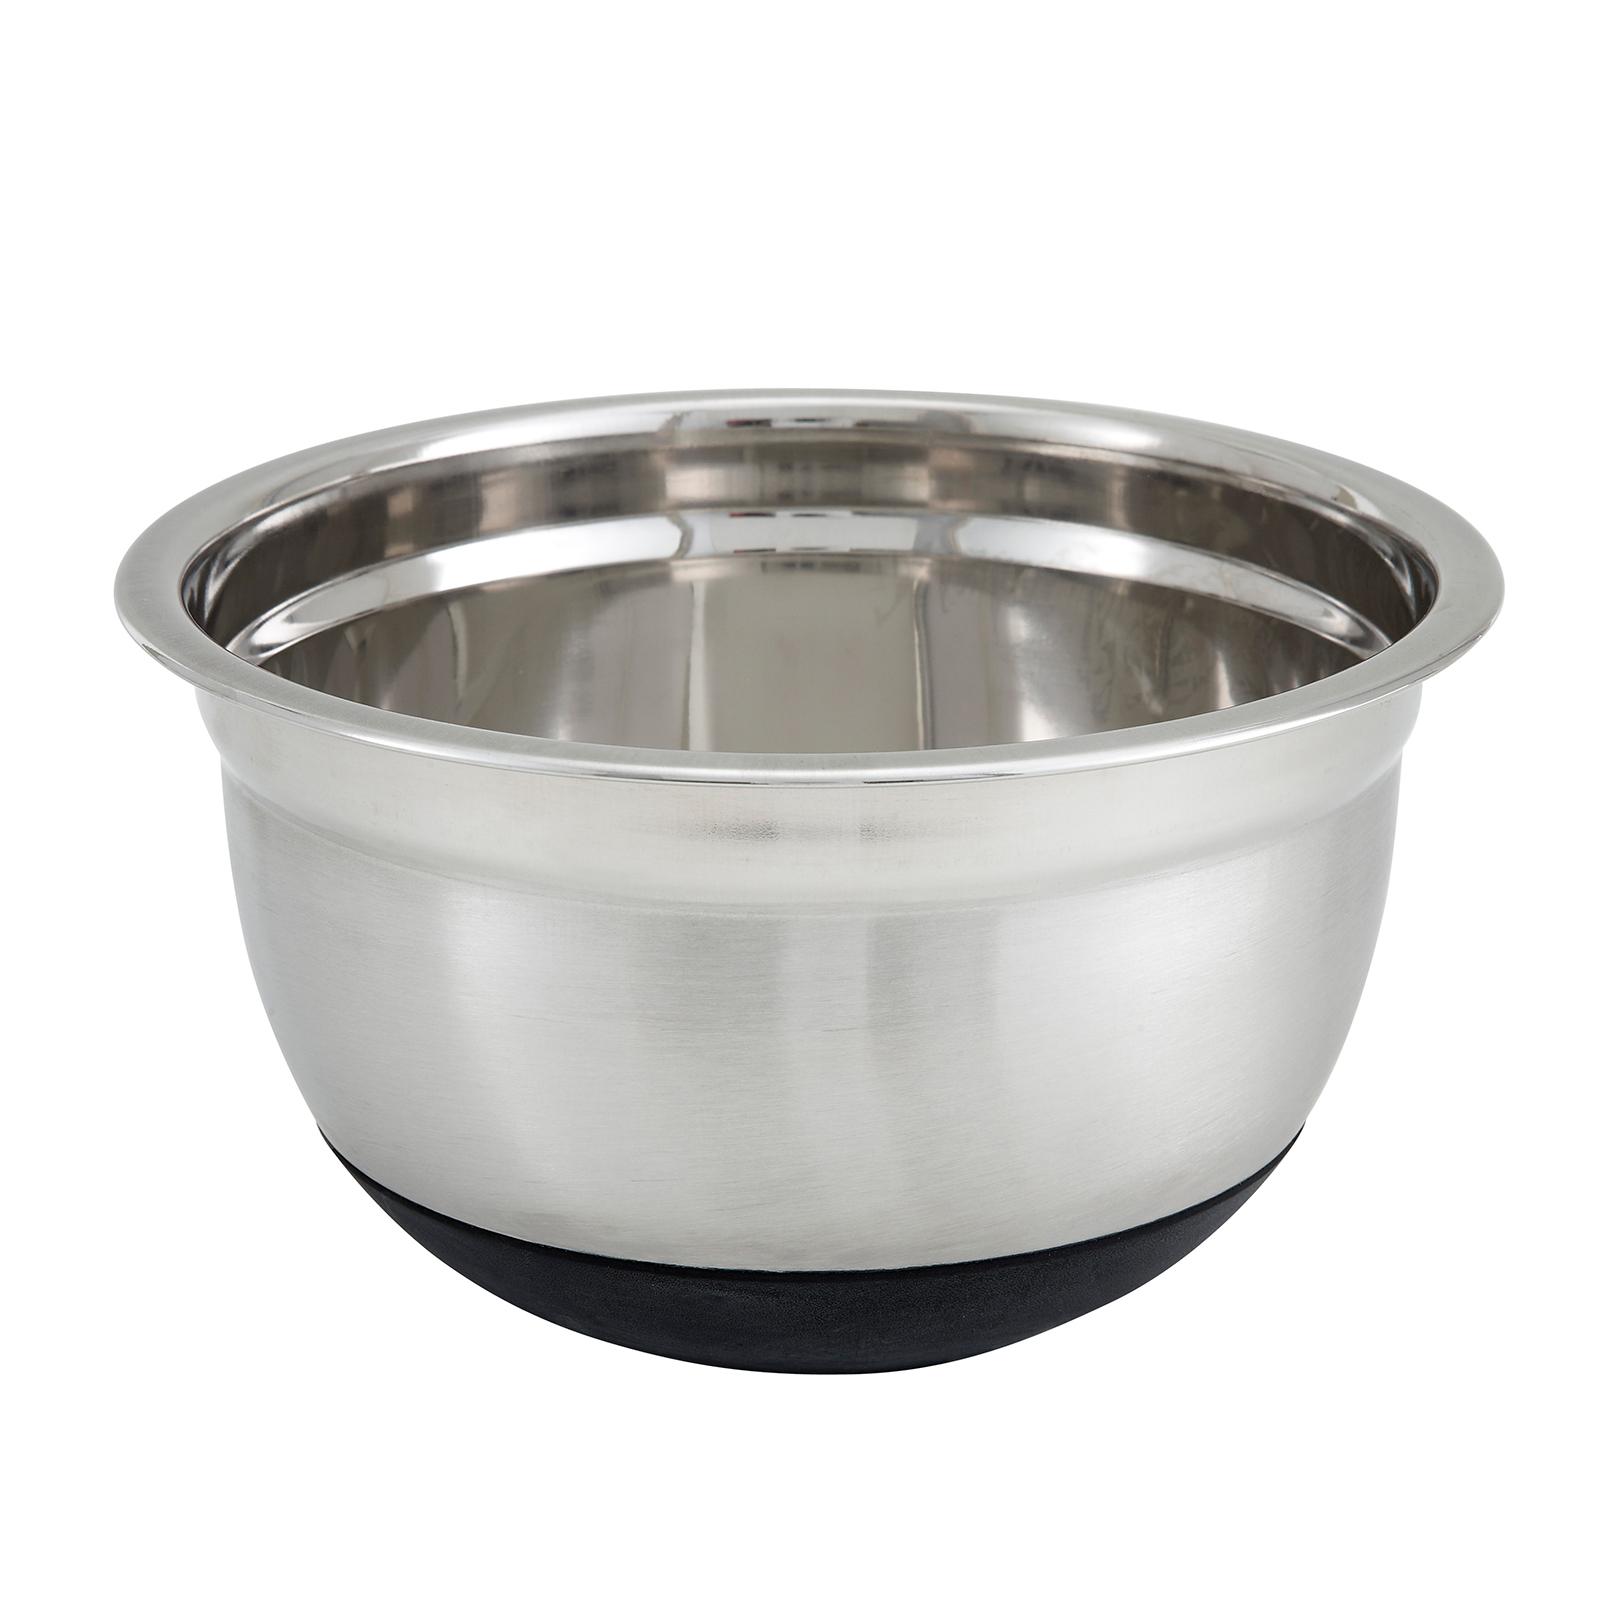 1650-13 Winco MXRU-800 mixing bowl, metal